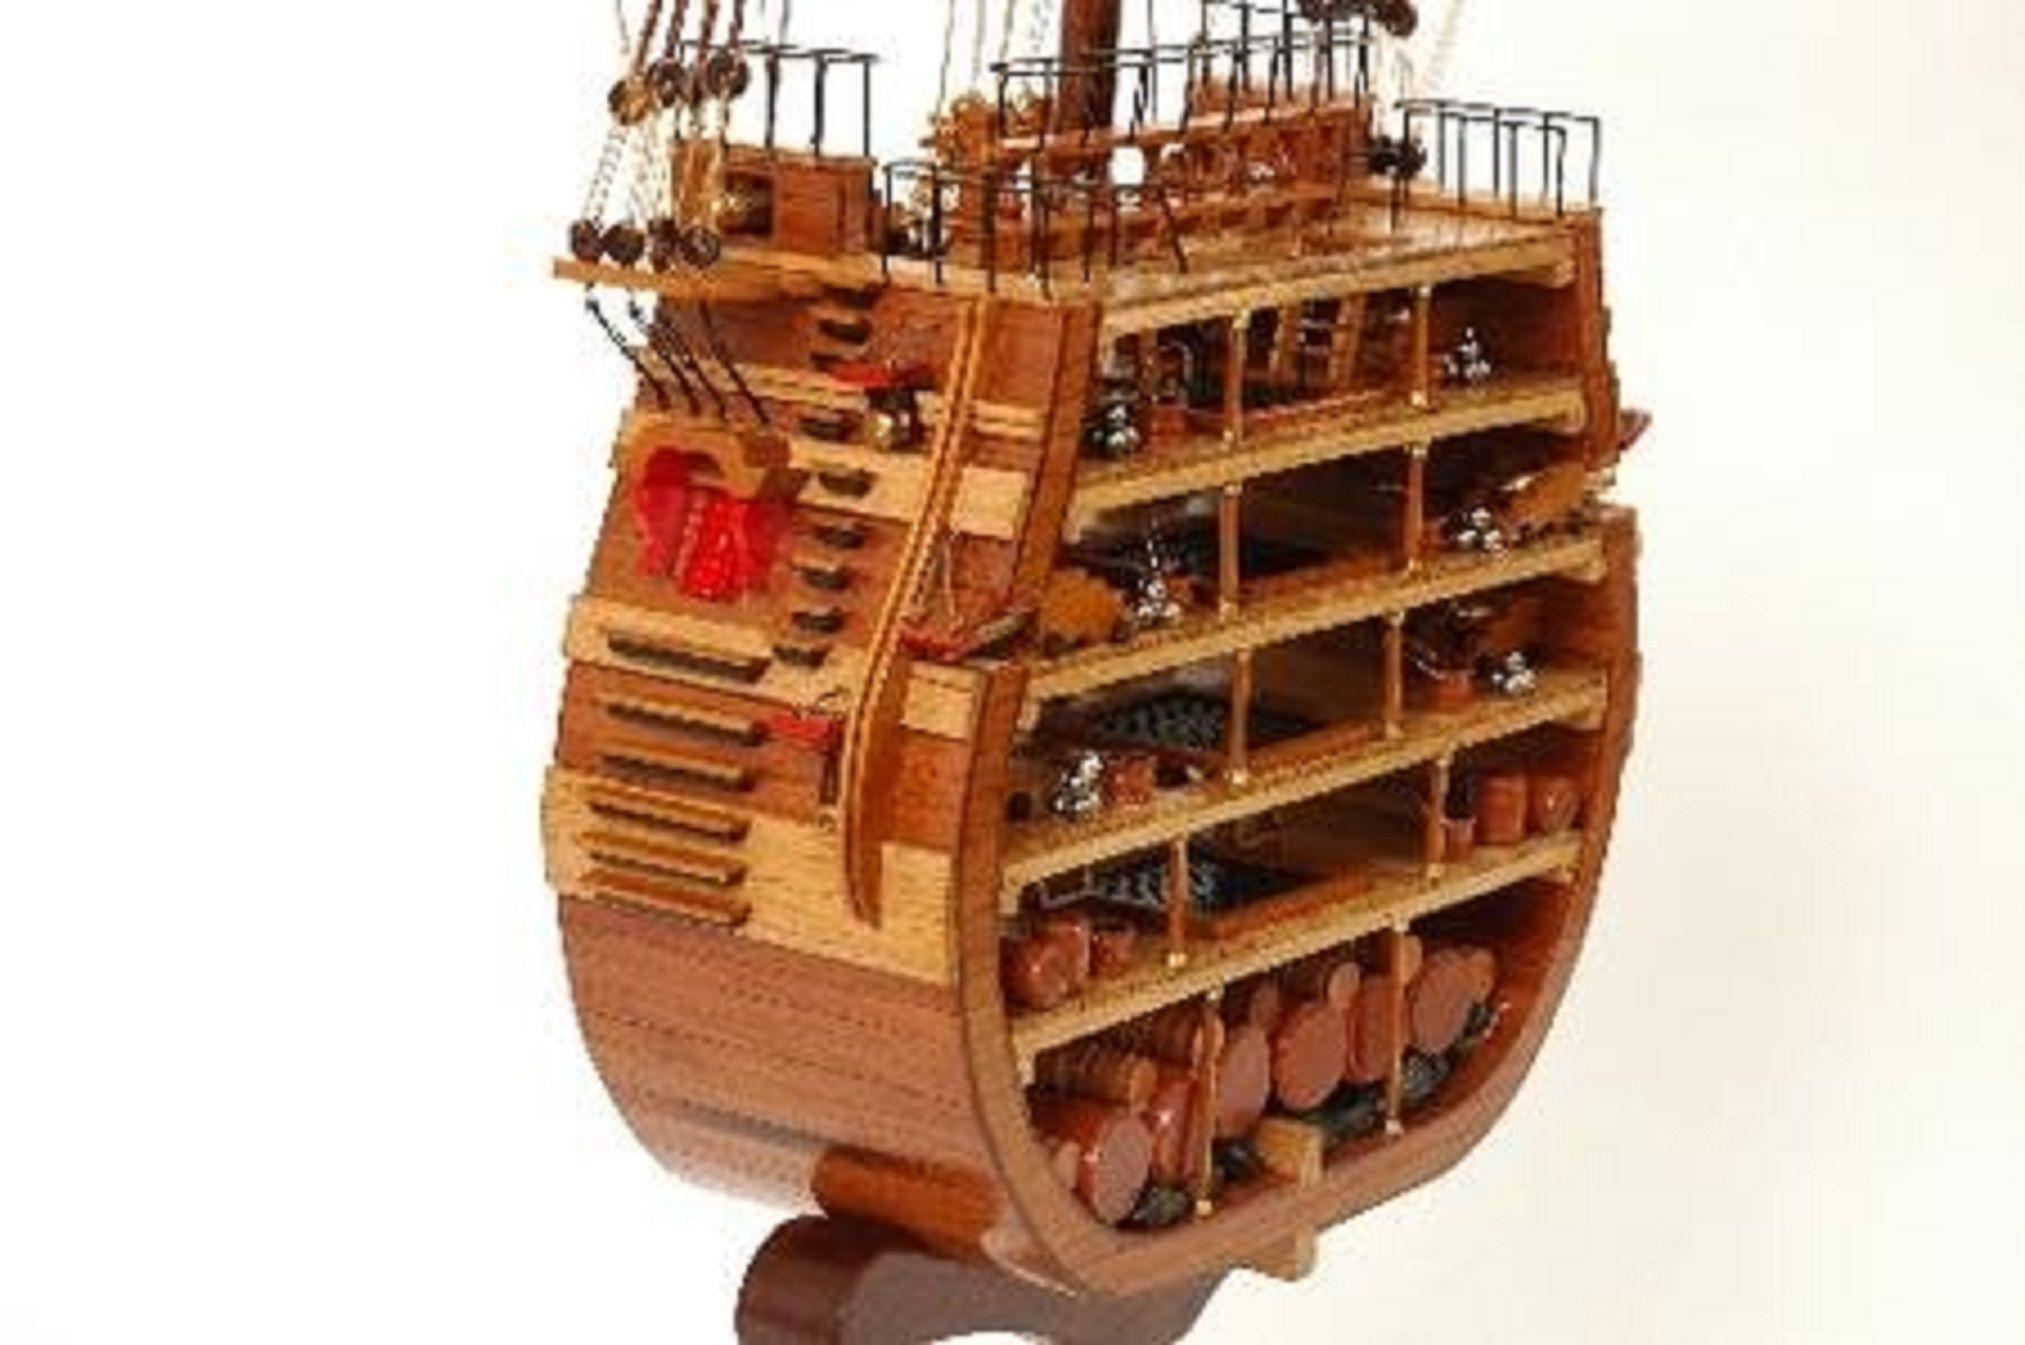 330-7455-HMS-Victory-Cross-Section-Model-Ship-Premier-Range